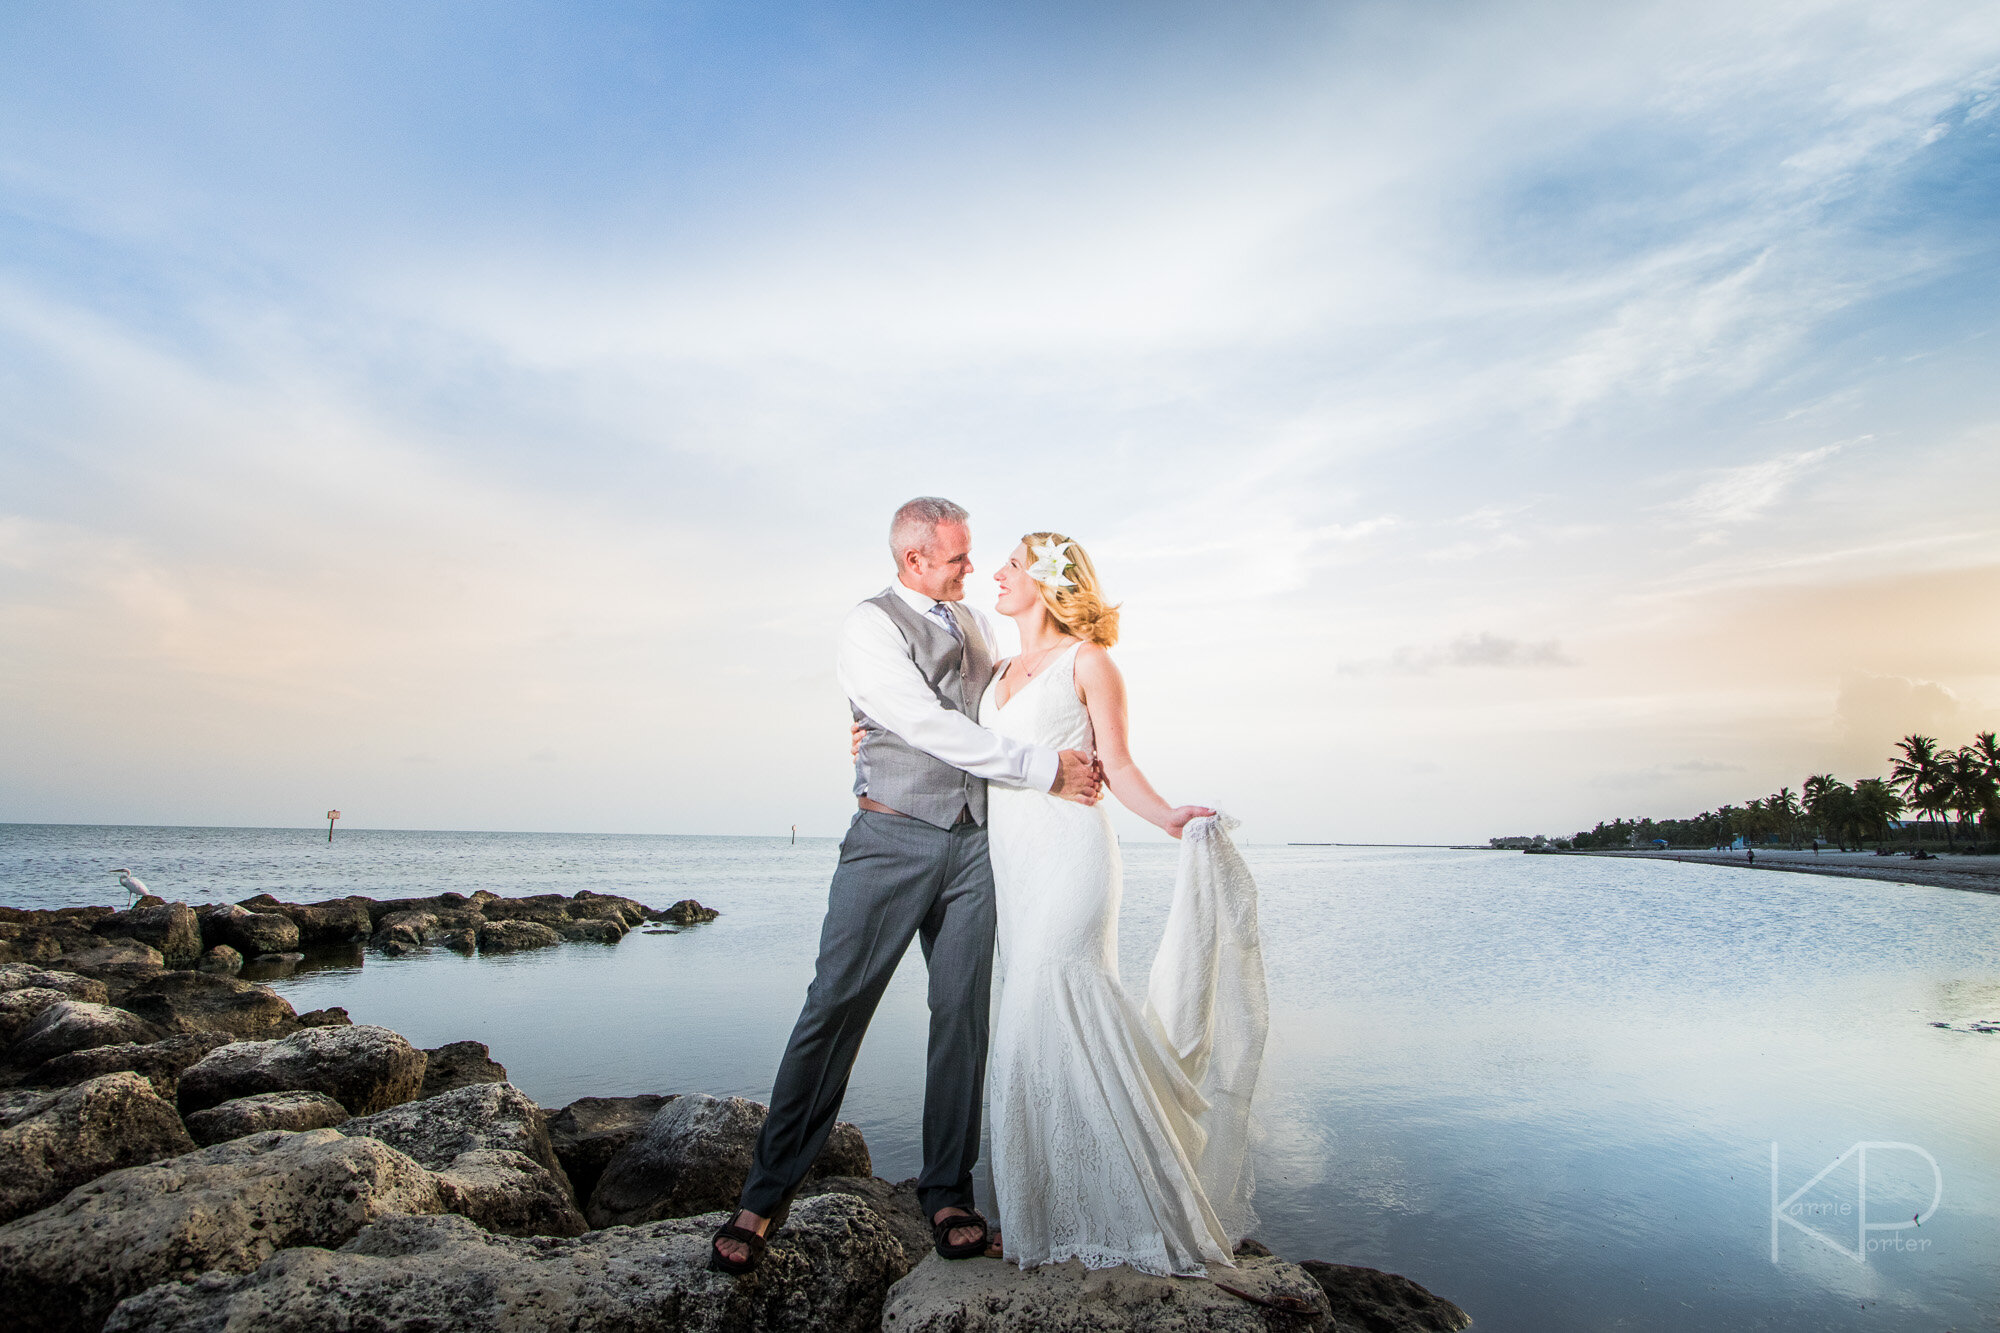 Bride and groom posing in historic building in Key West